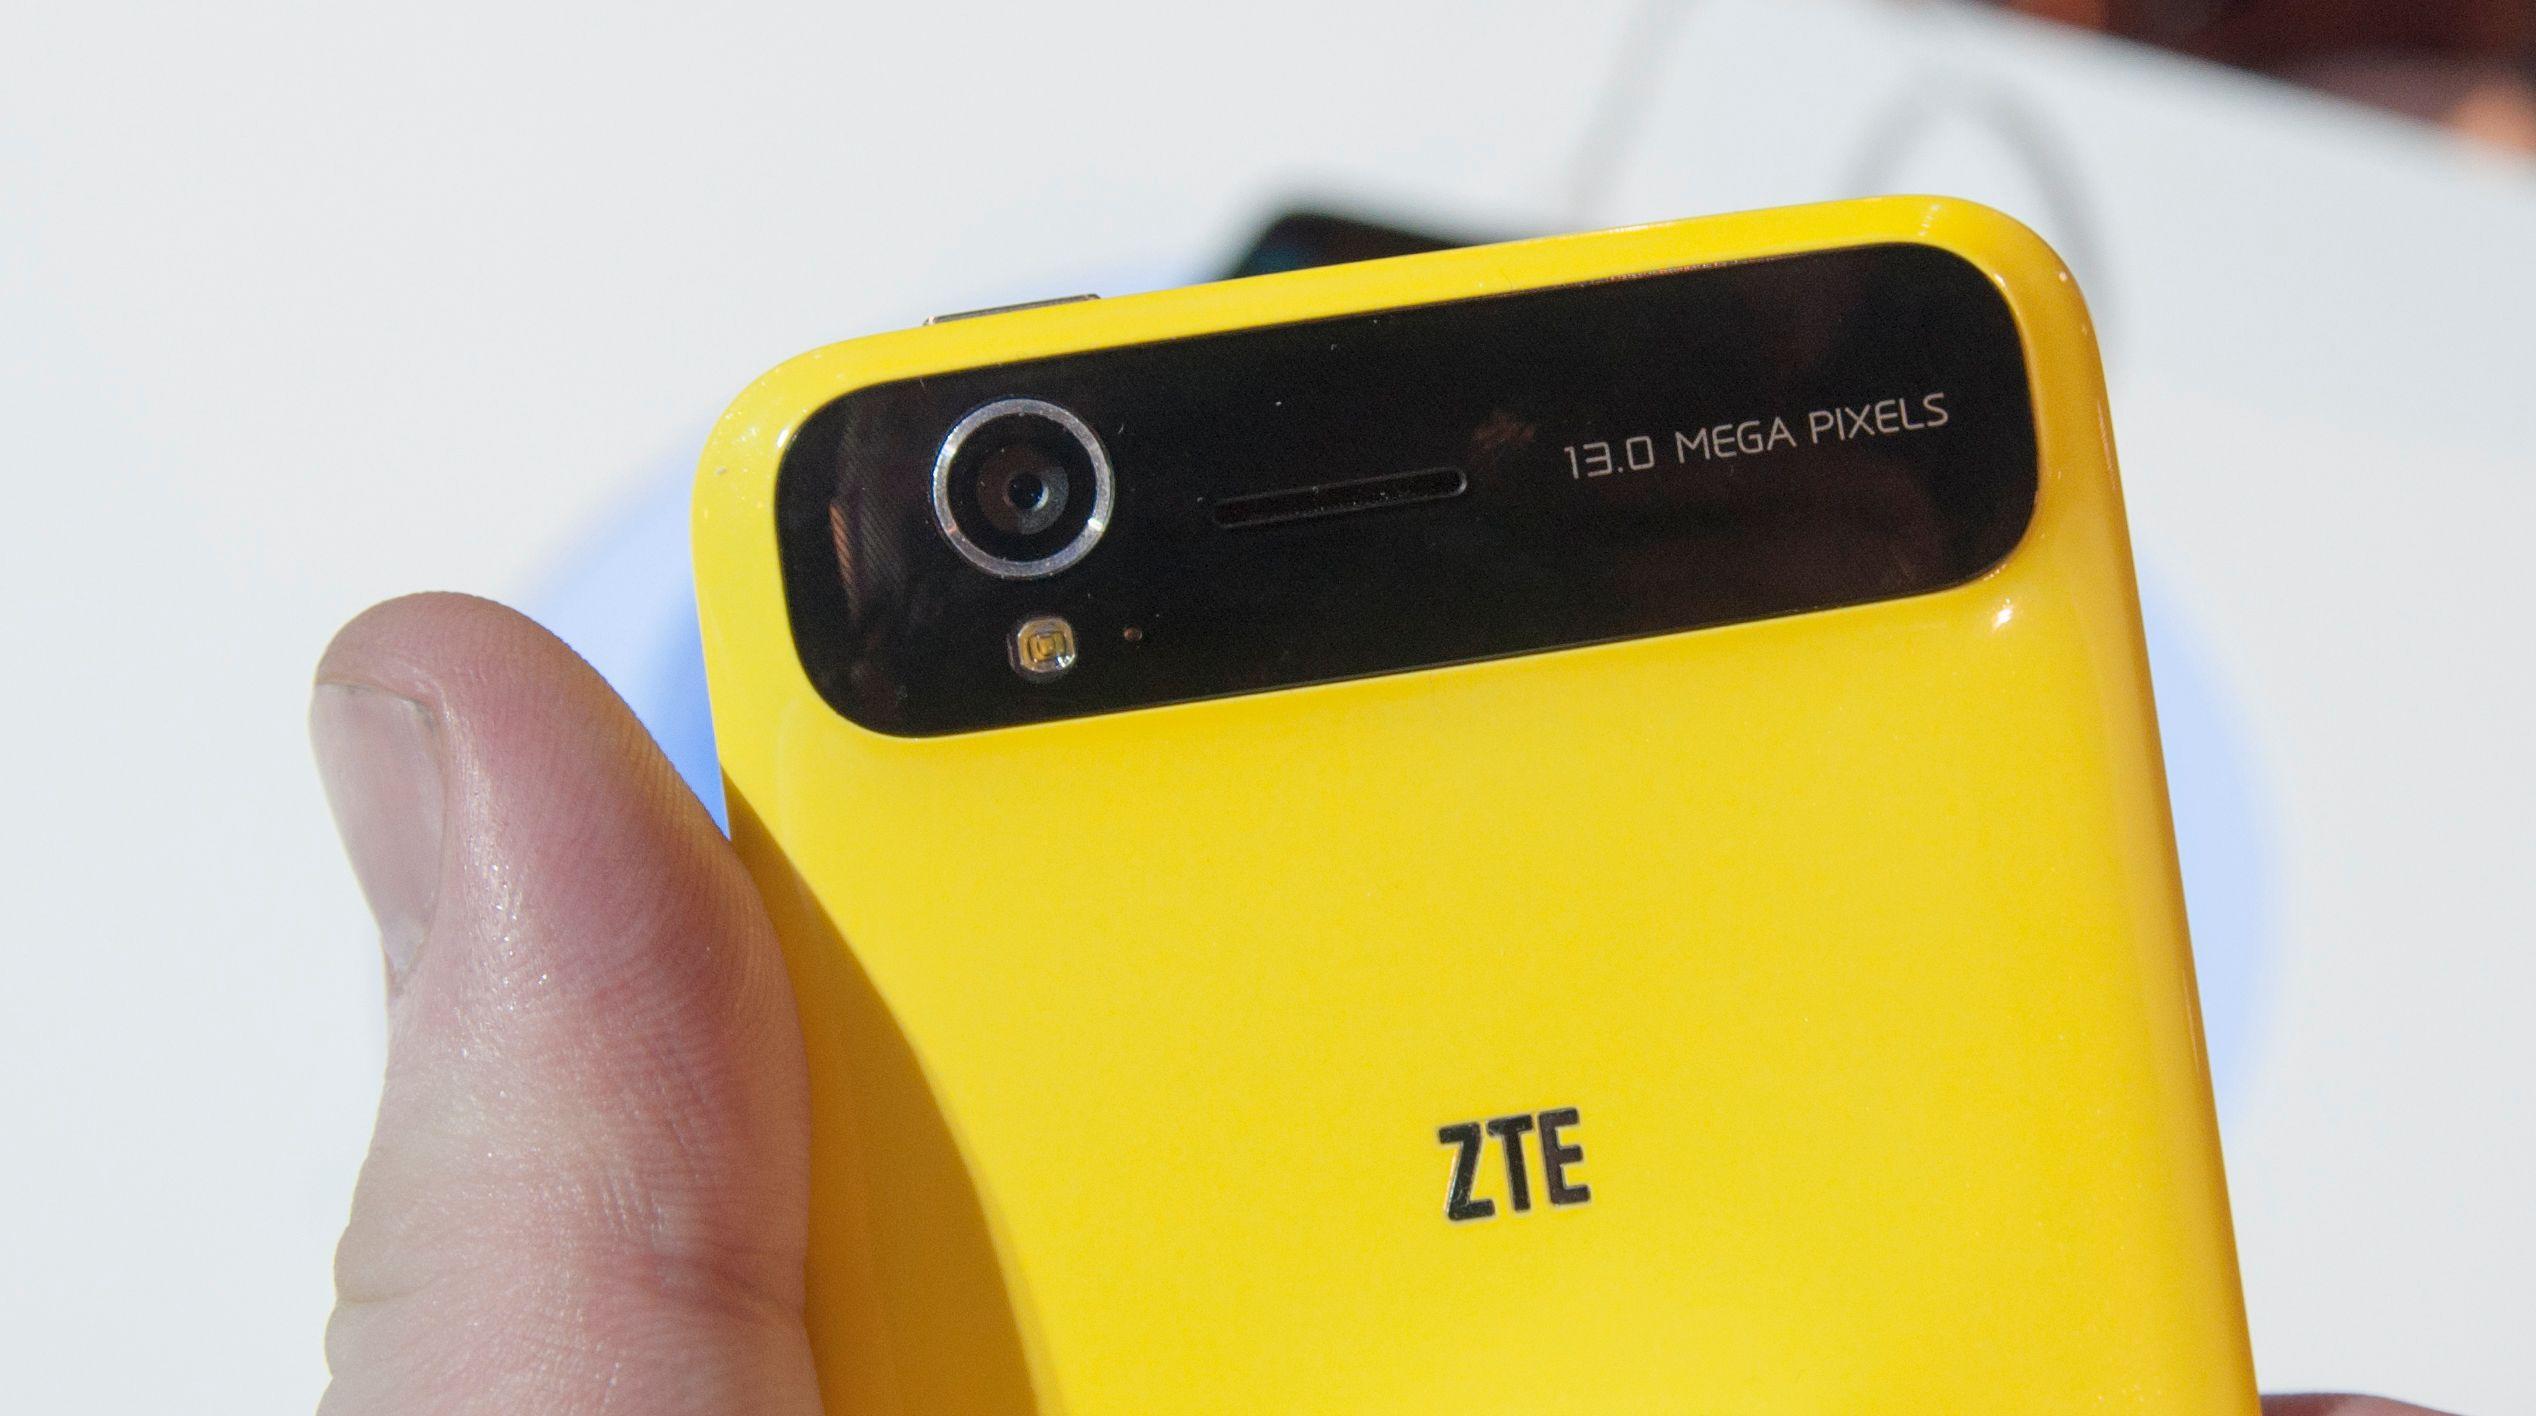 Akkurat rundt kameraet har telefonen en liten kul.Foto: Finn Jarle Kvalheim, Amobil.no